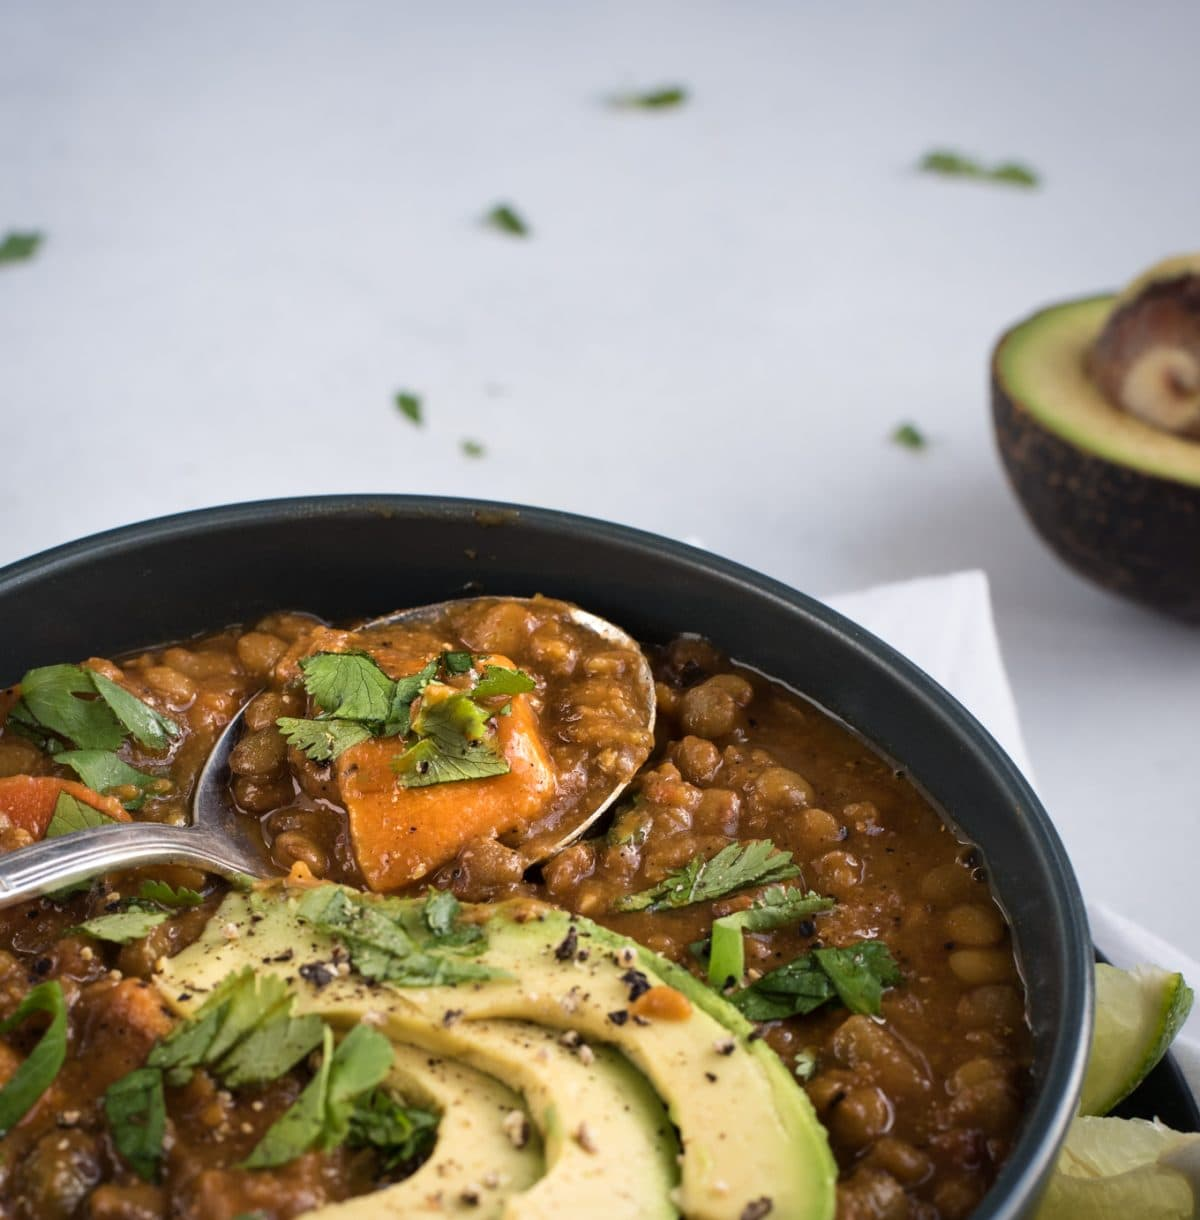 Spoon full of sweet potato lentil soup in a bowl